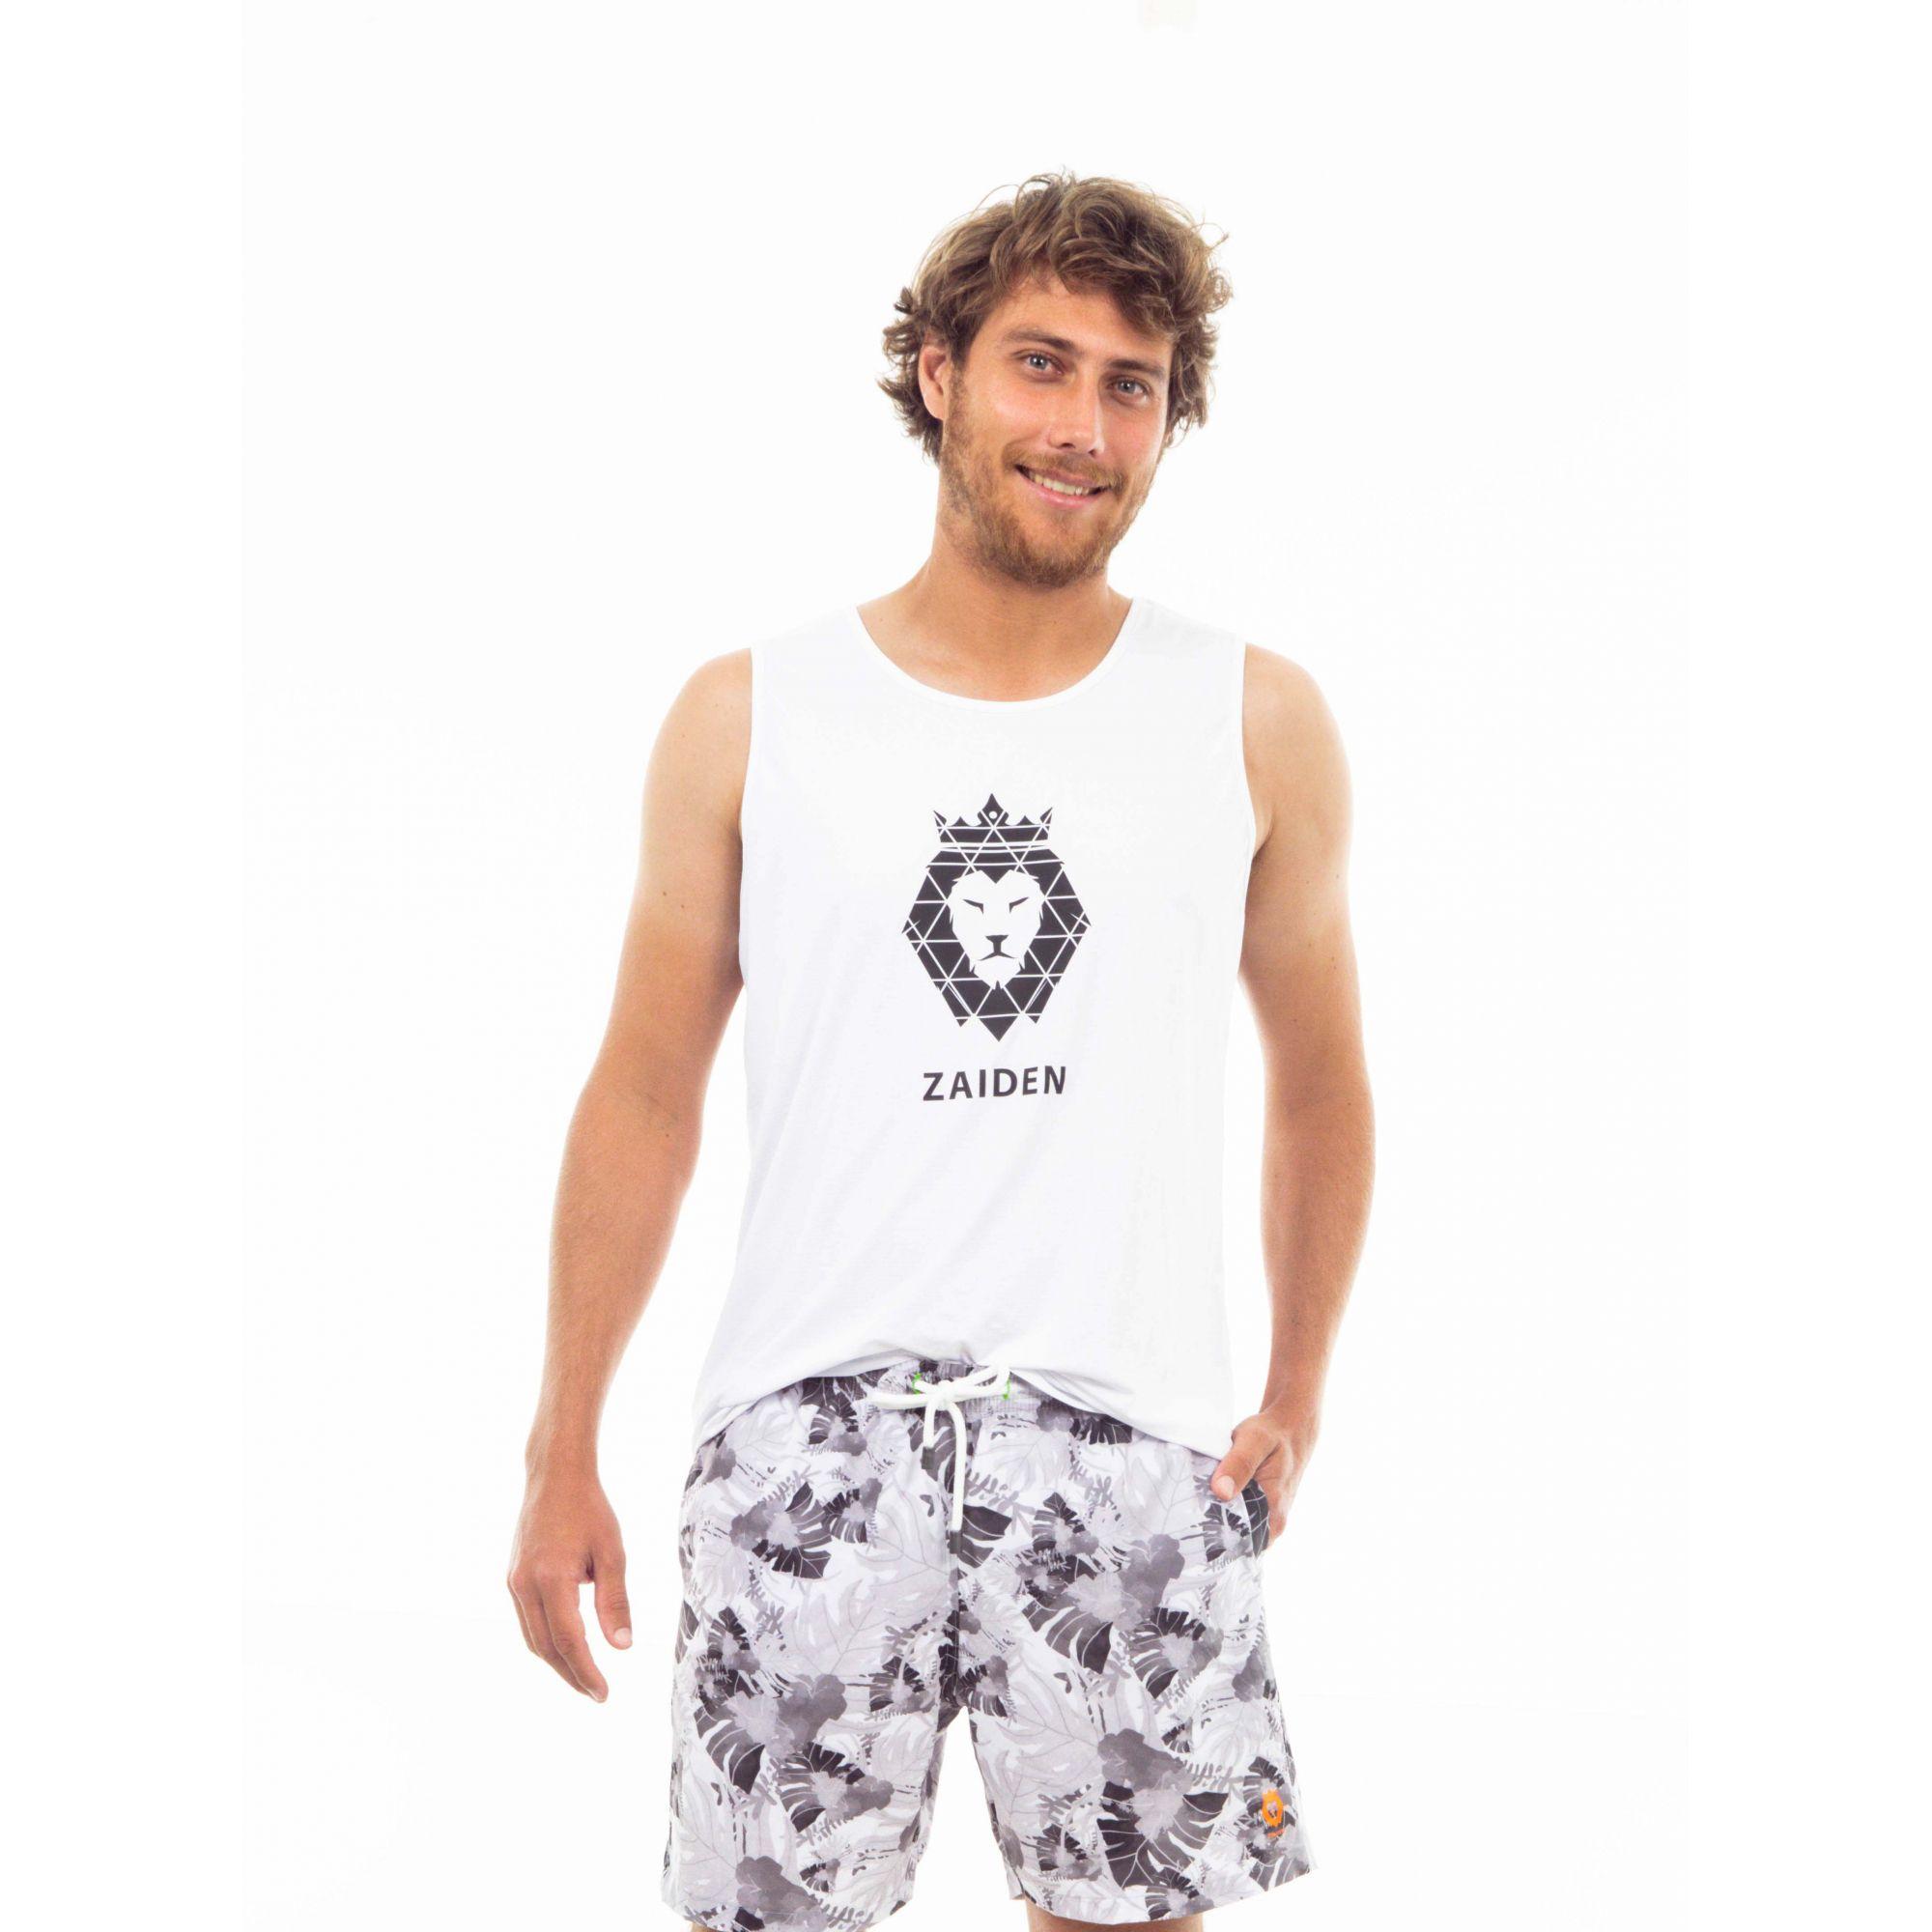 Regata Masculina Poliamida ZAIDEN Branca Leão Preto